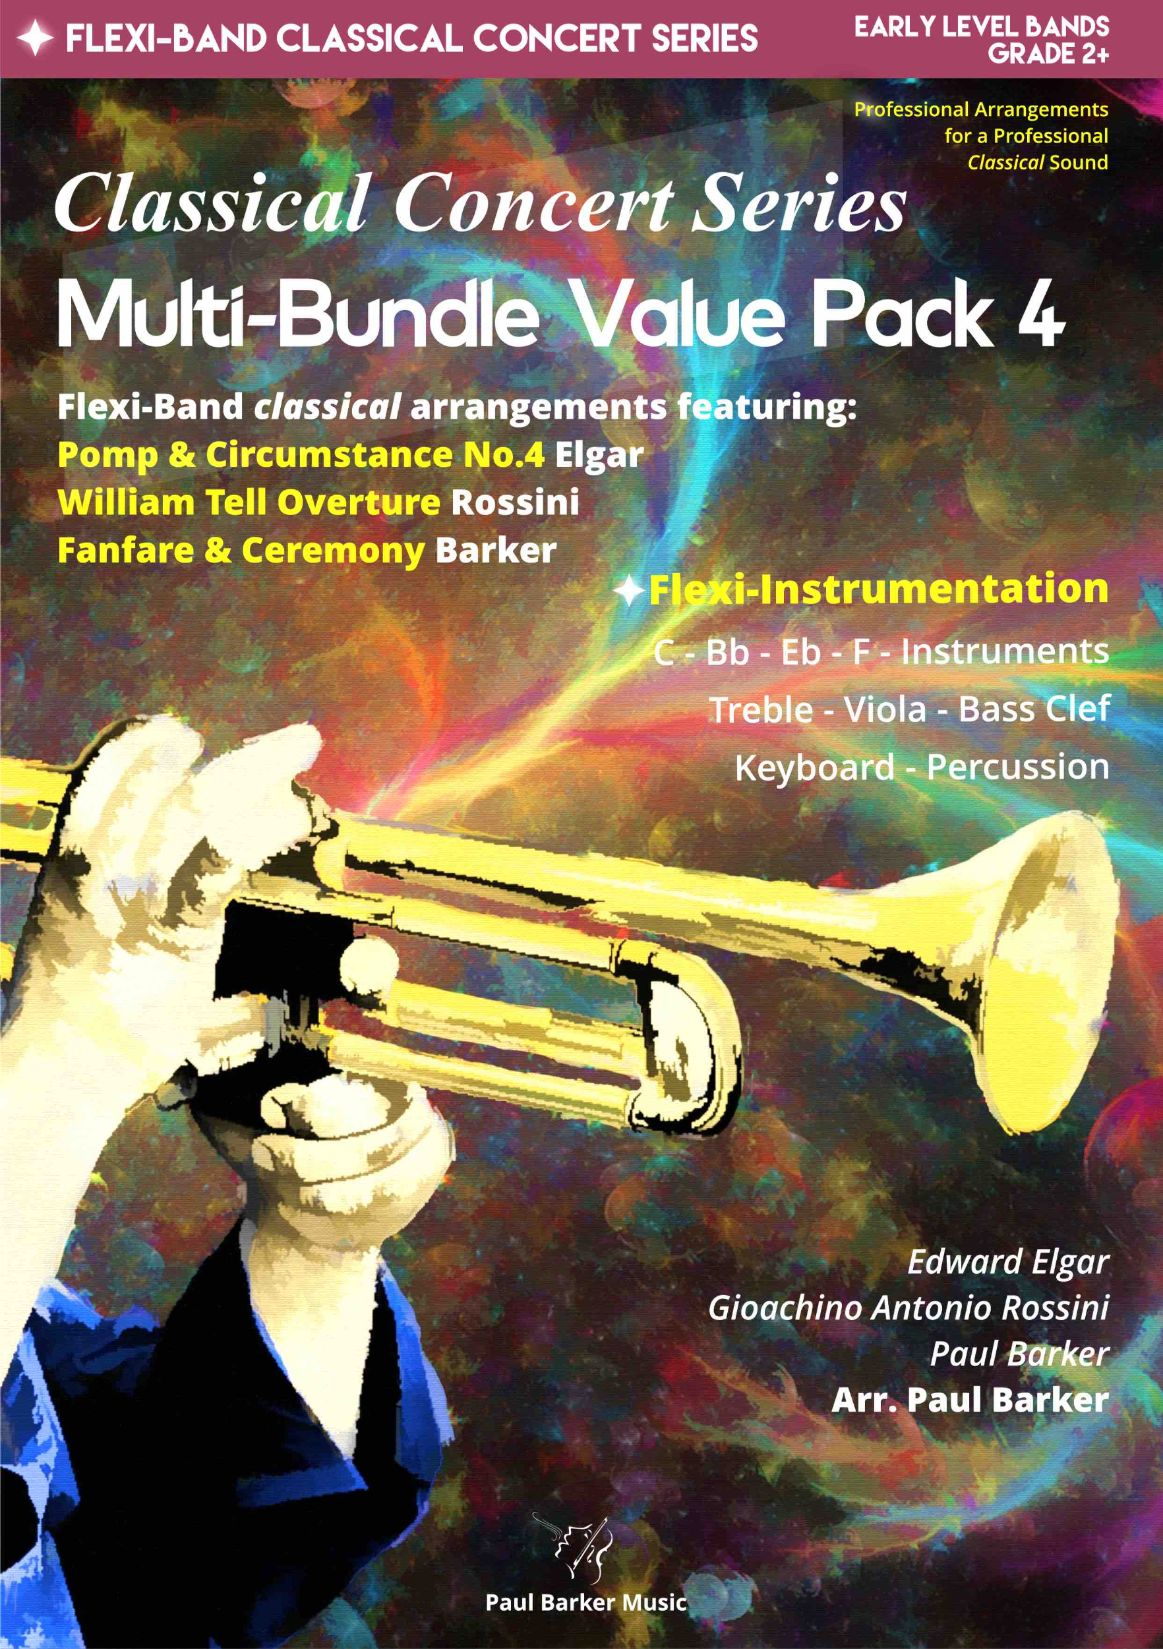 Flexi-Band Classical Concert Series - Multi-Bundle Pack 4